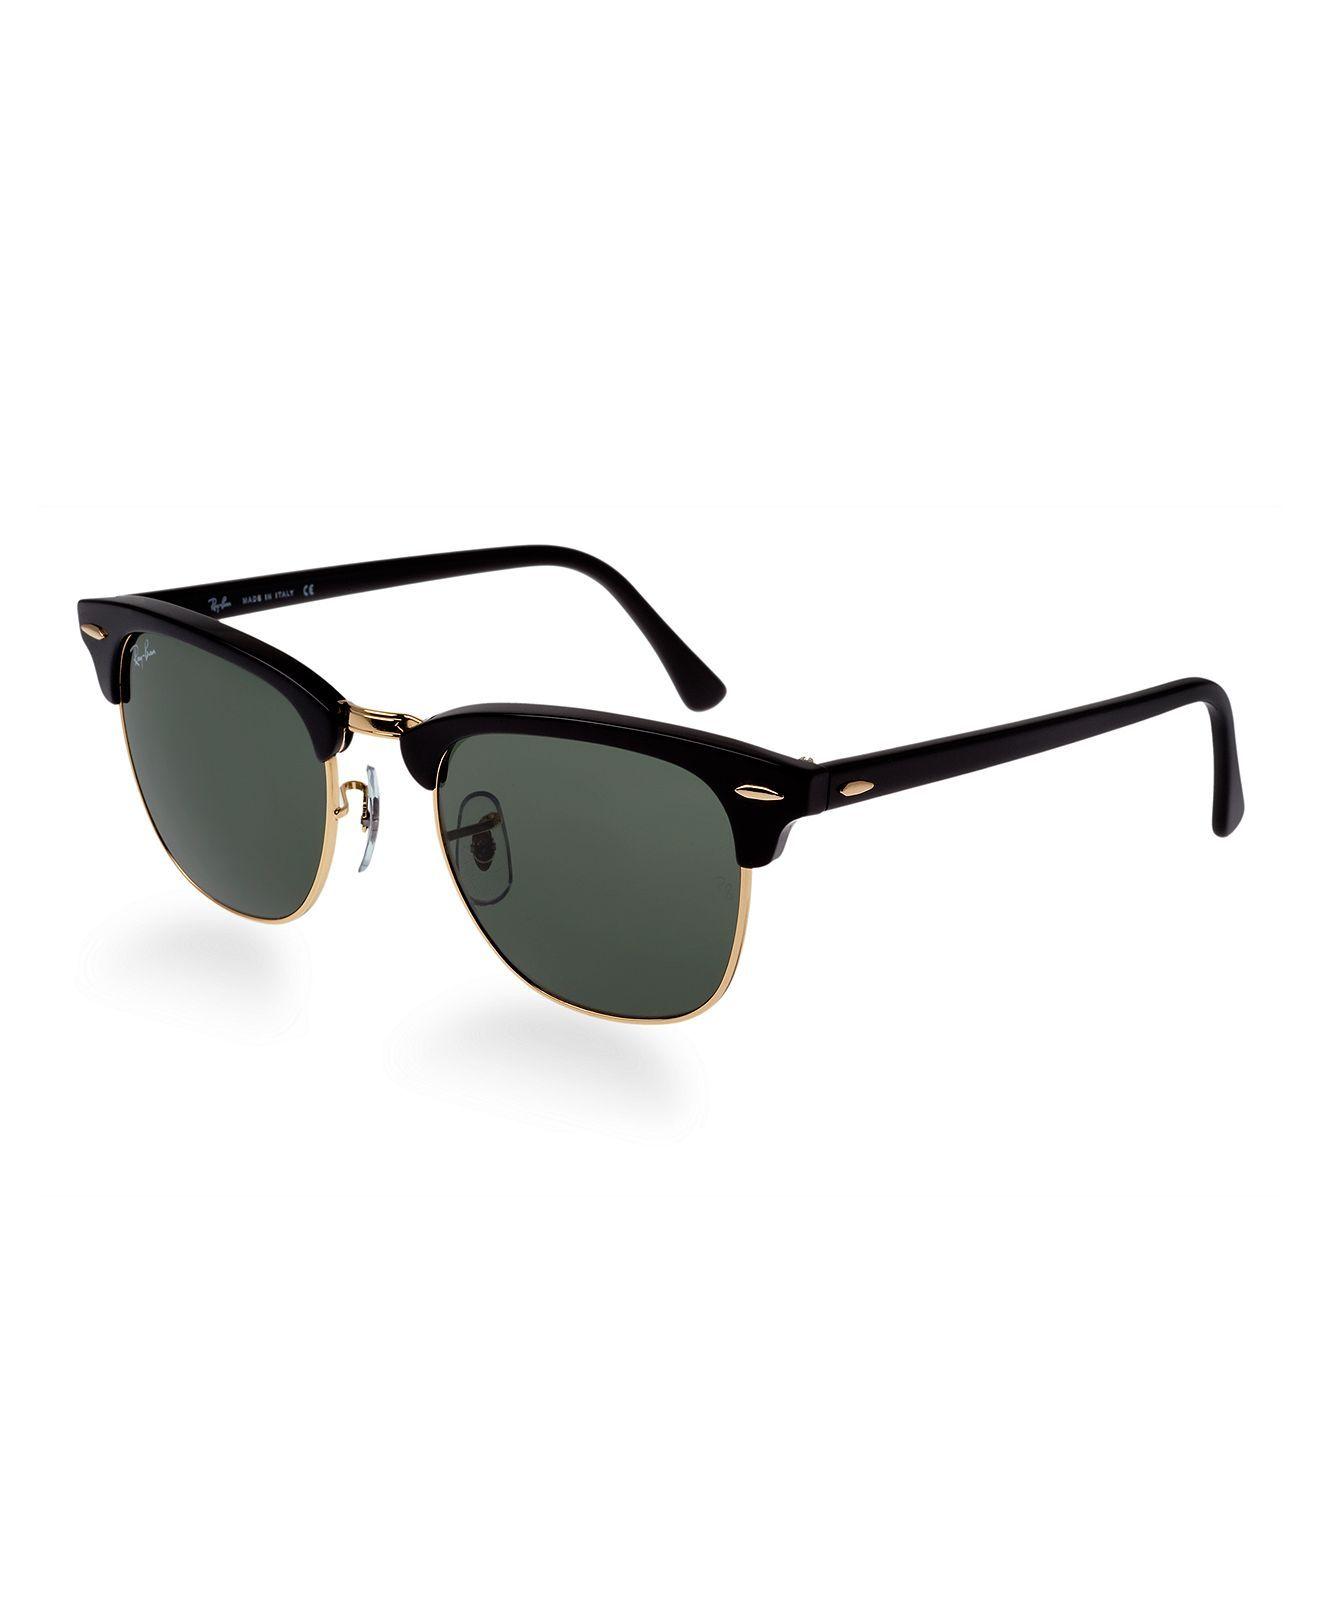 fbb971b9c0 Ray-Ban Sunglasses, RB3016 49 Clubmaster - Sunglasses - Handbags &  Accessories - Macy's